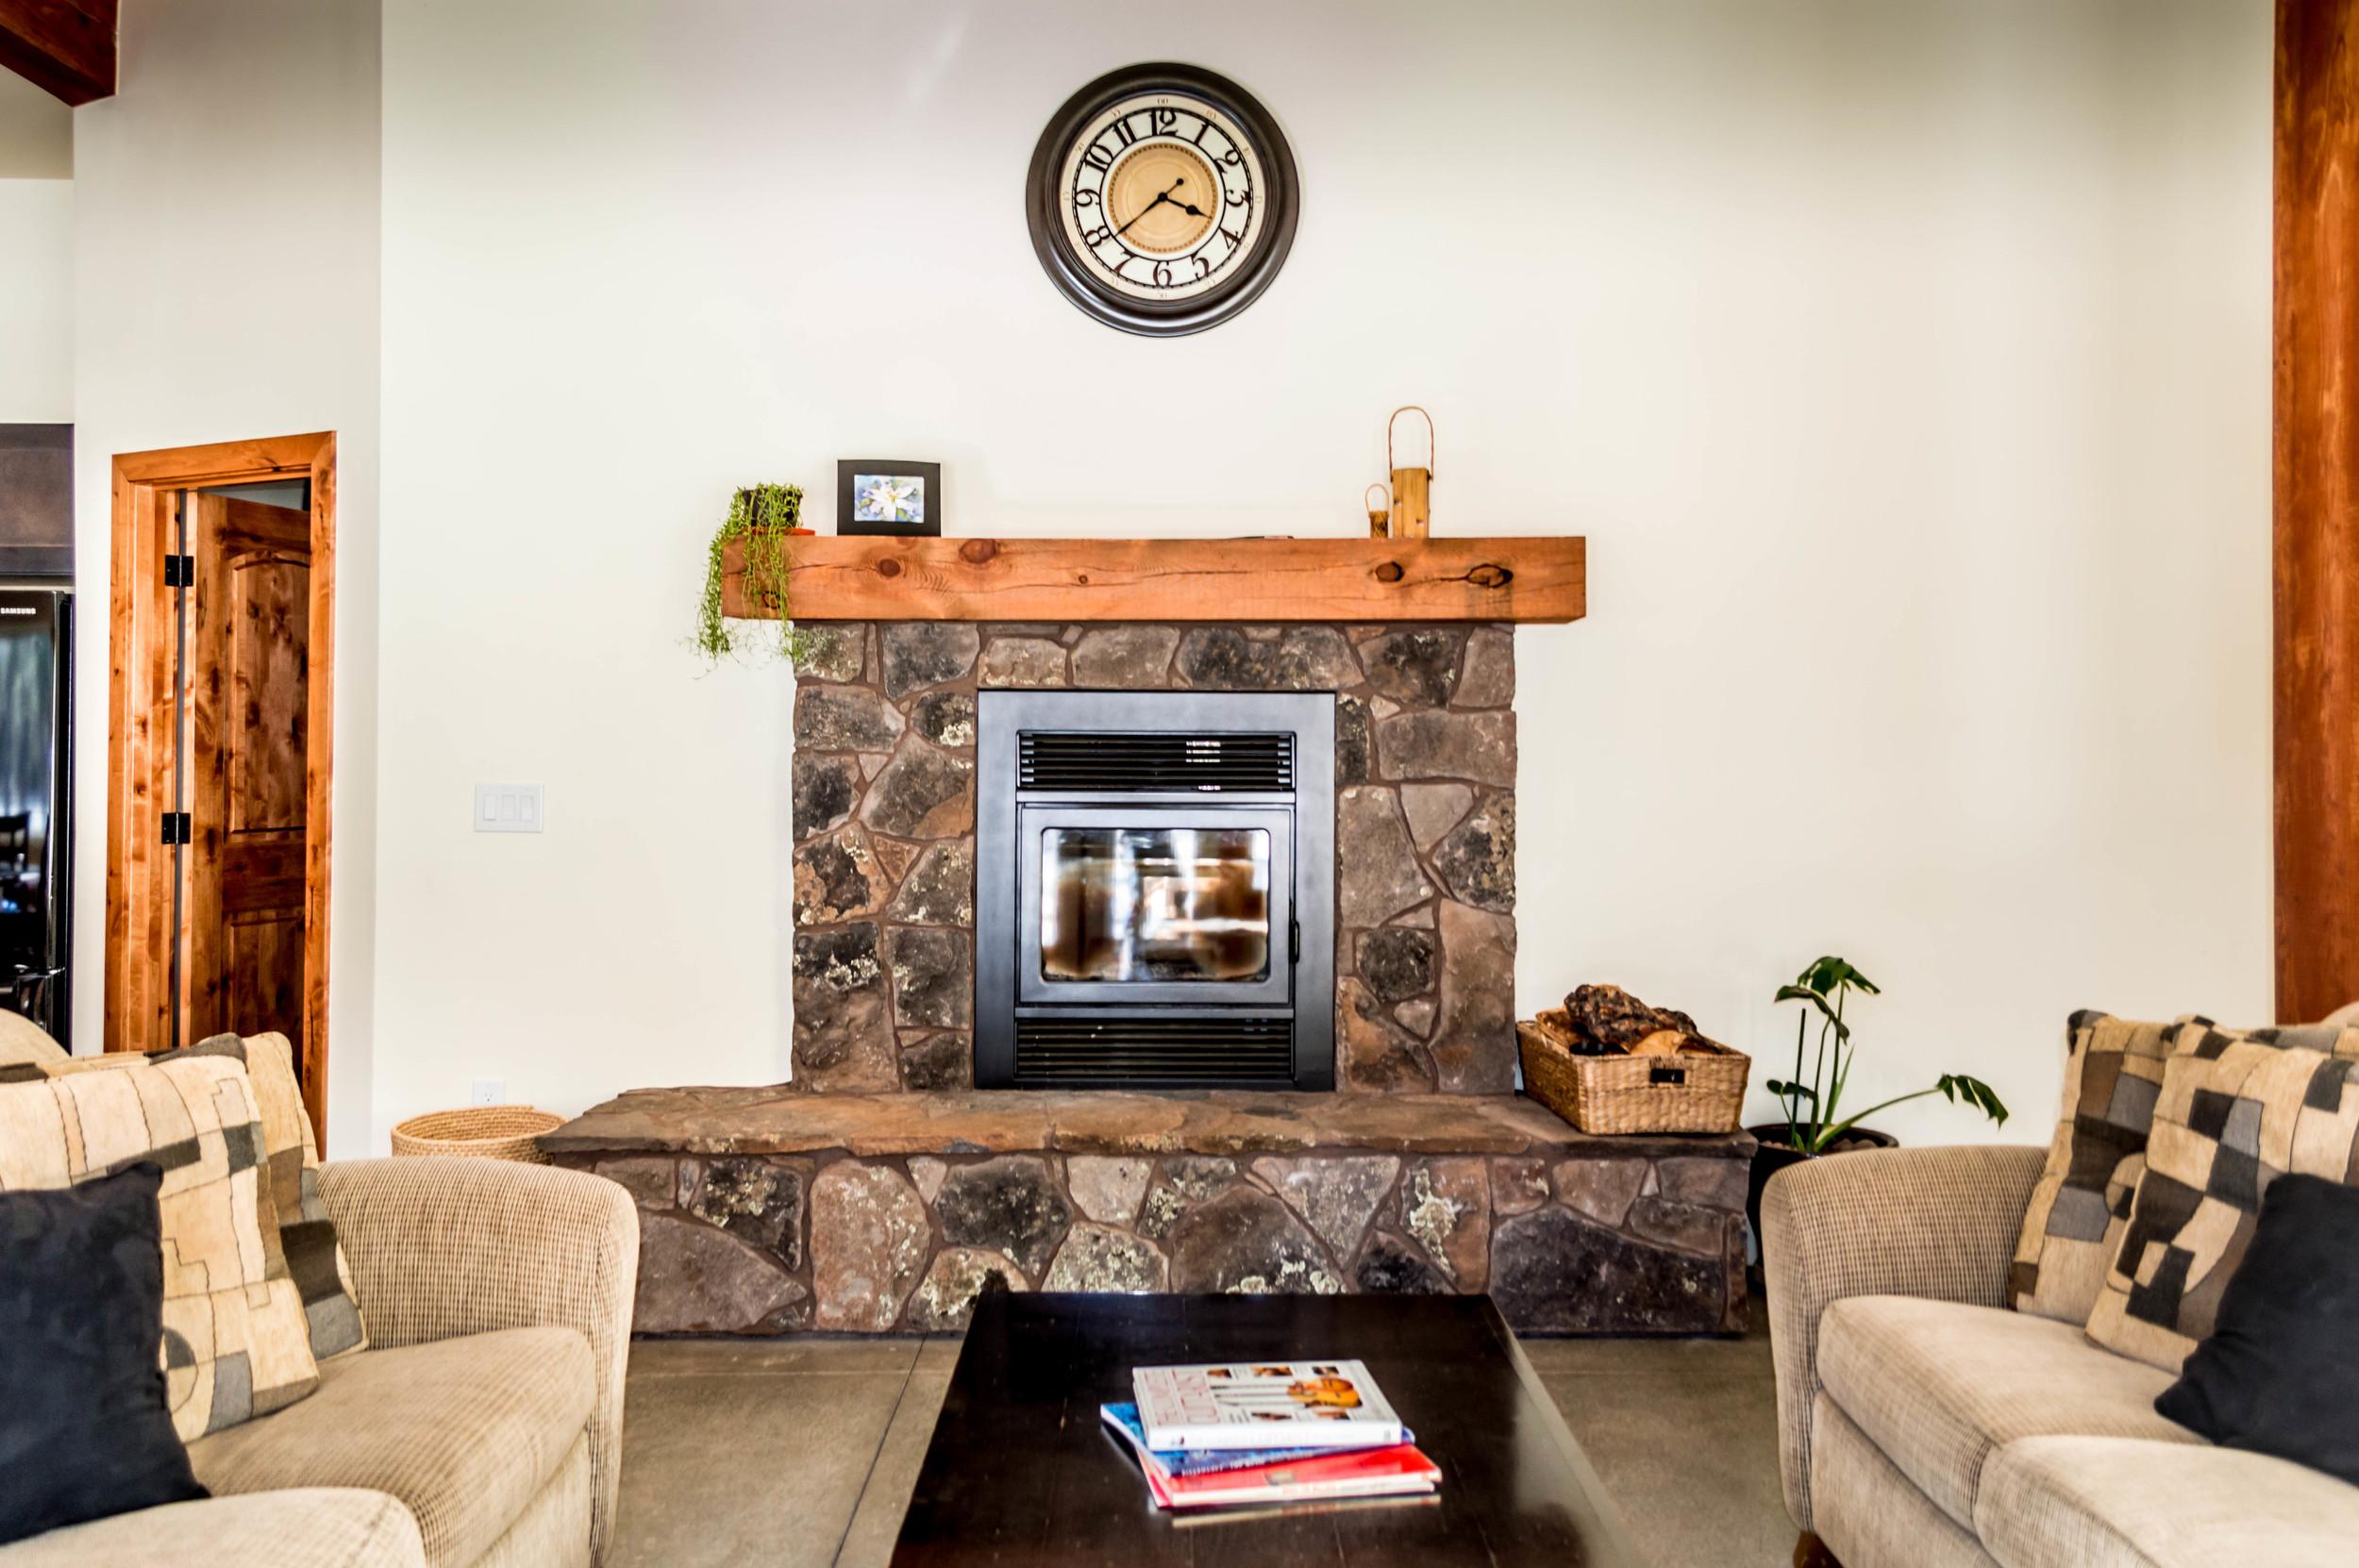 Custom fireplace in a residential home near Flagstaff, Arizona.